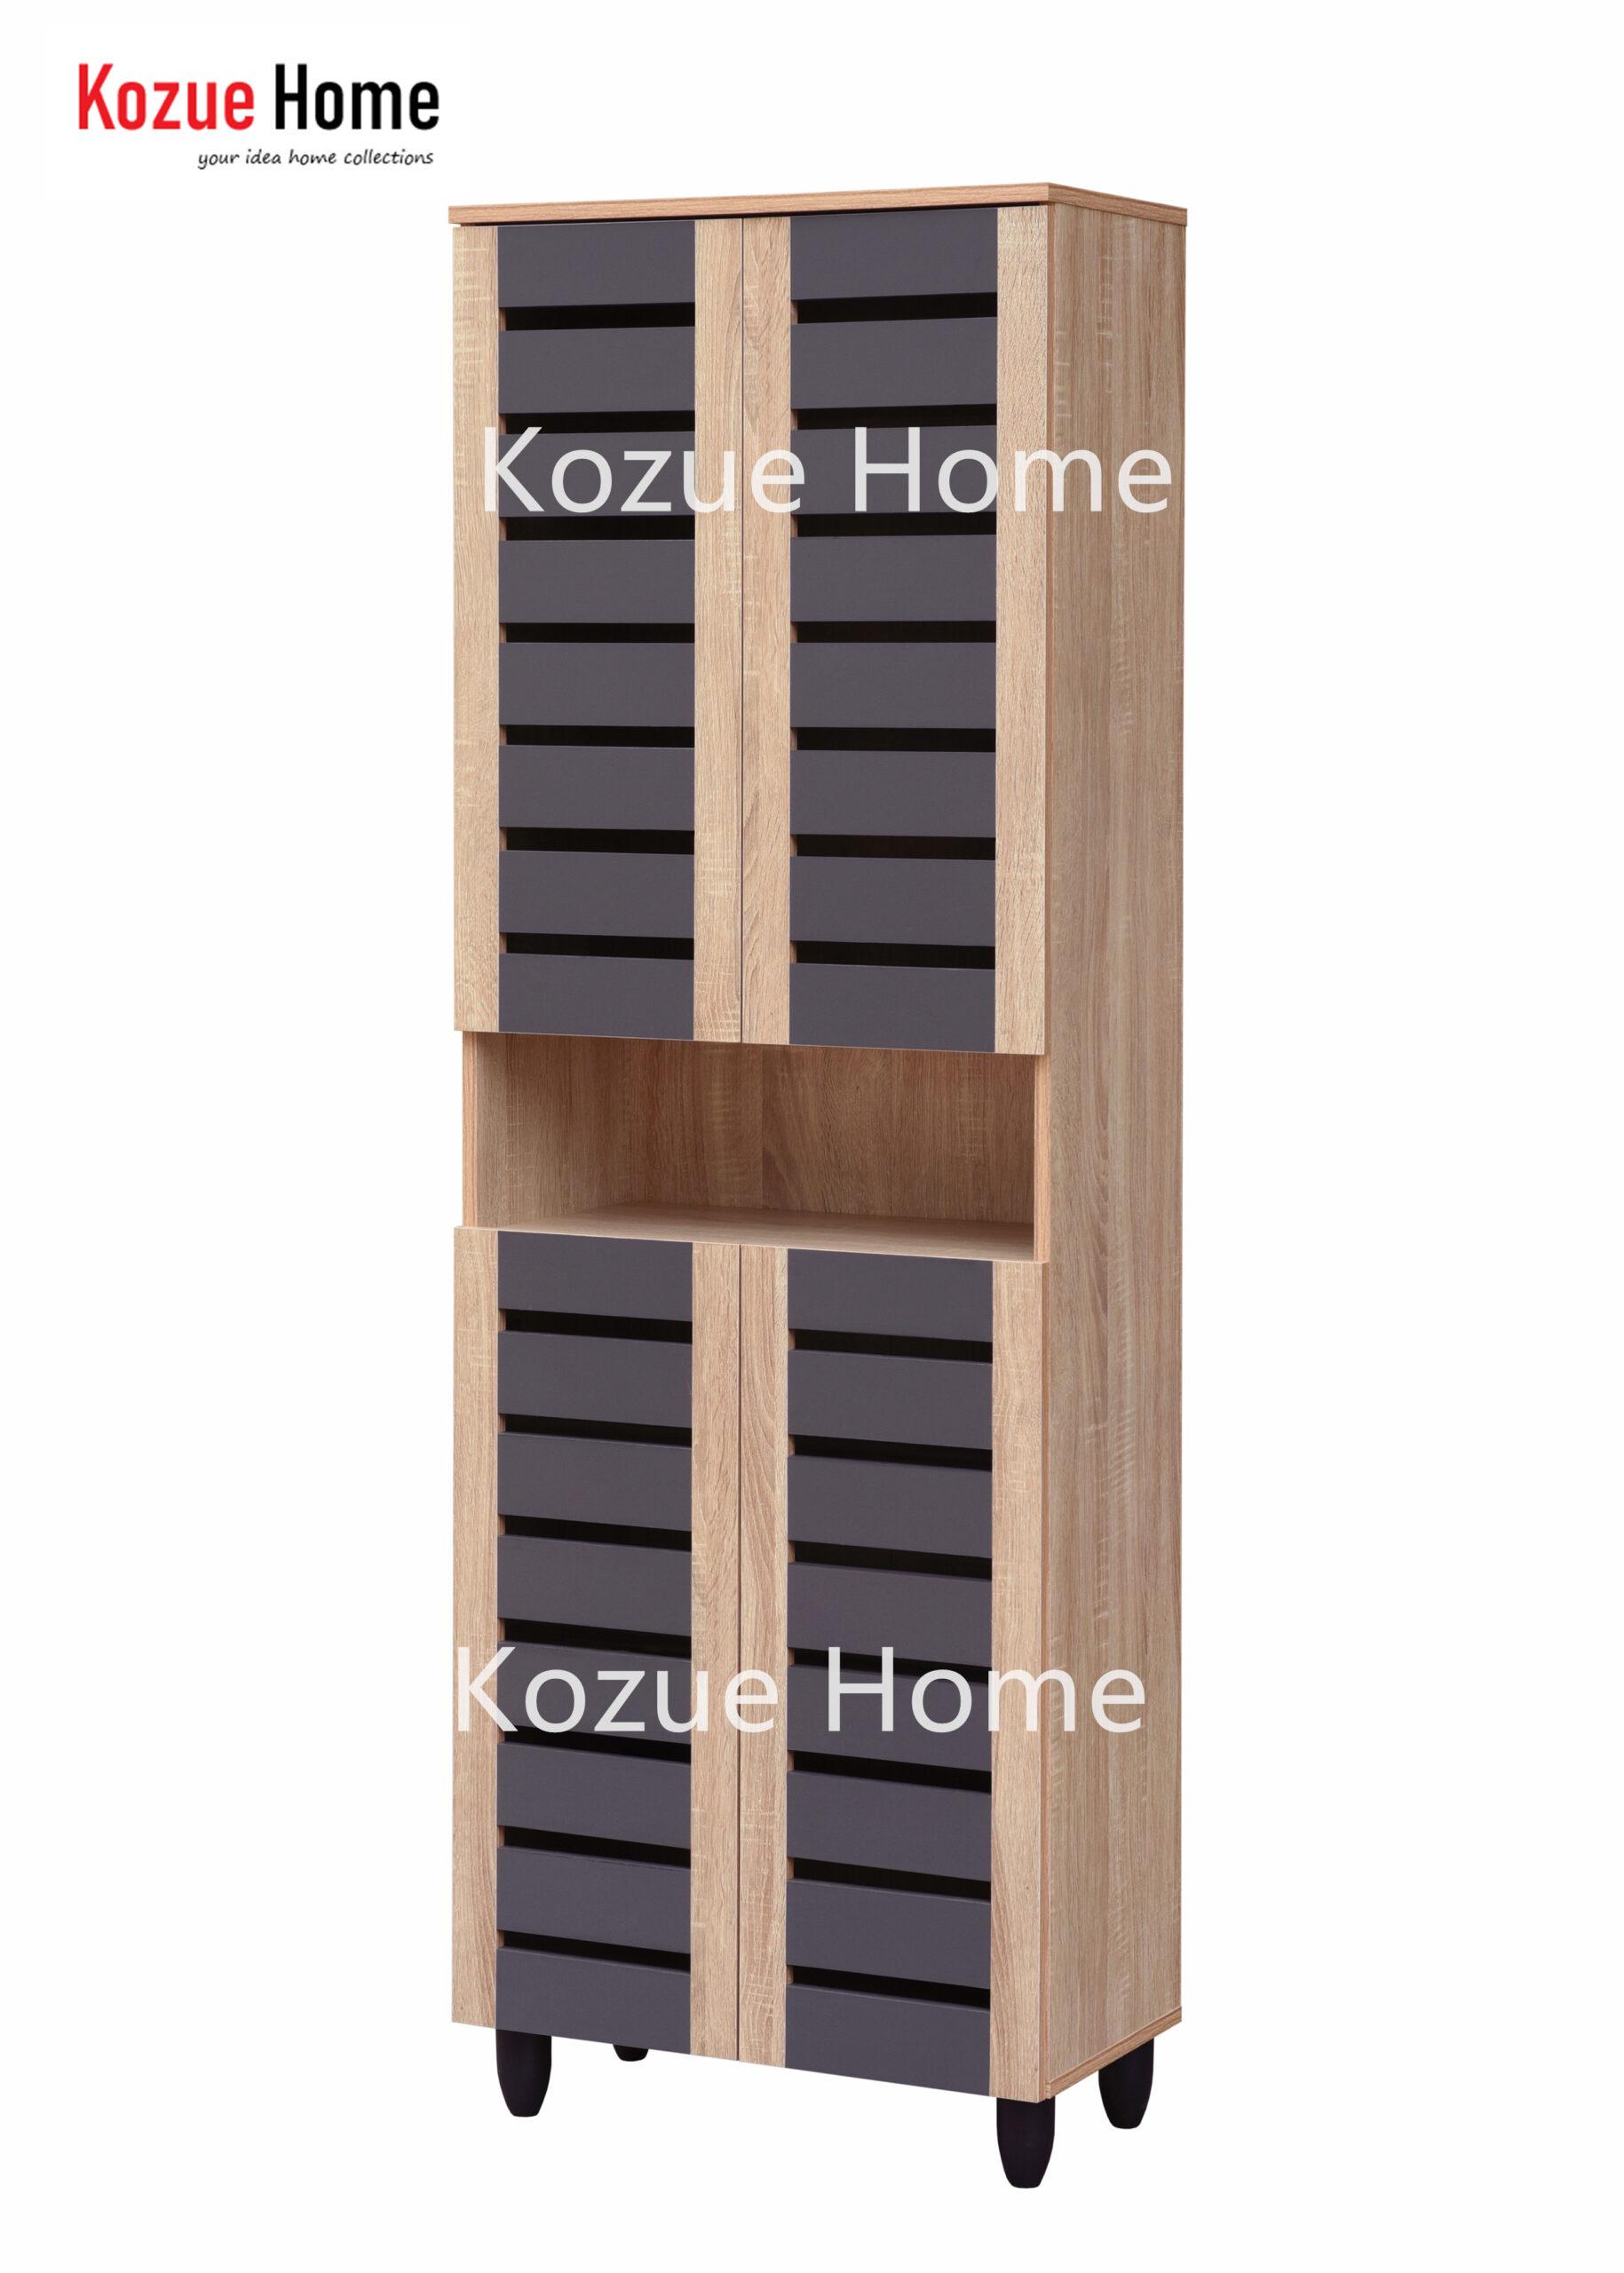 Tori 4 Doors Shoes Cabinet / Shoes Rack / Multi-function Cabinet